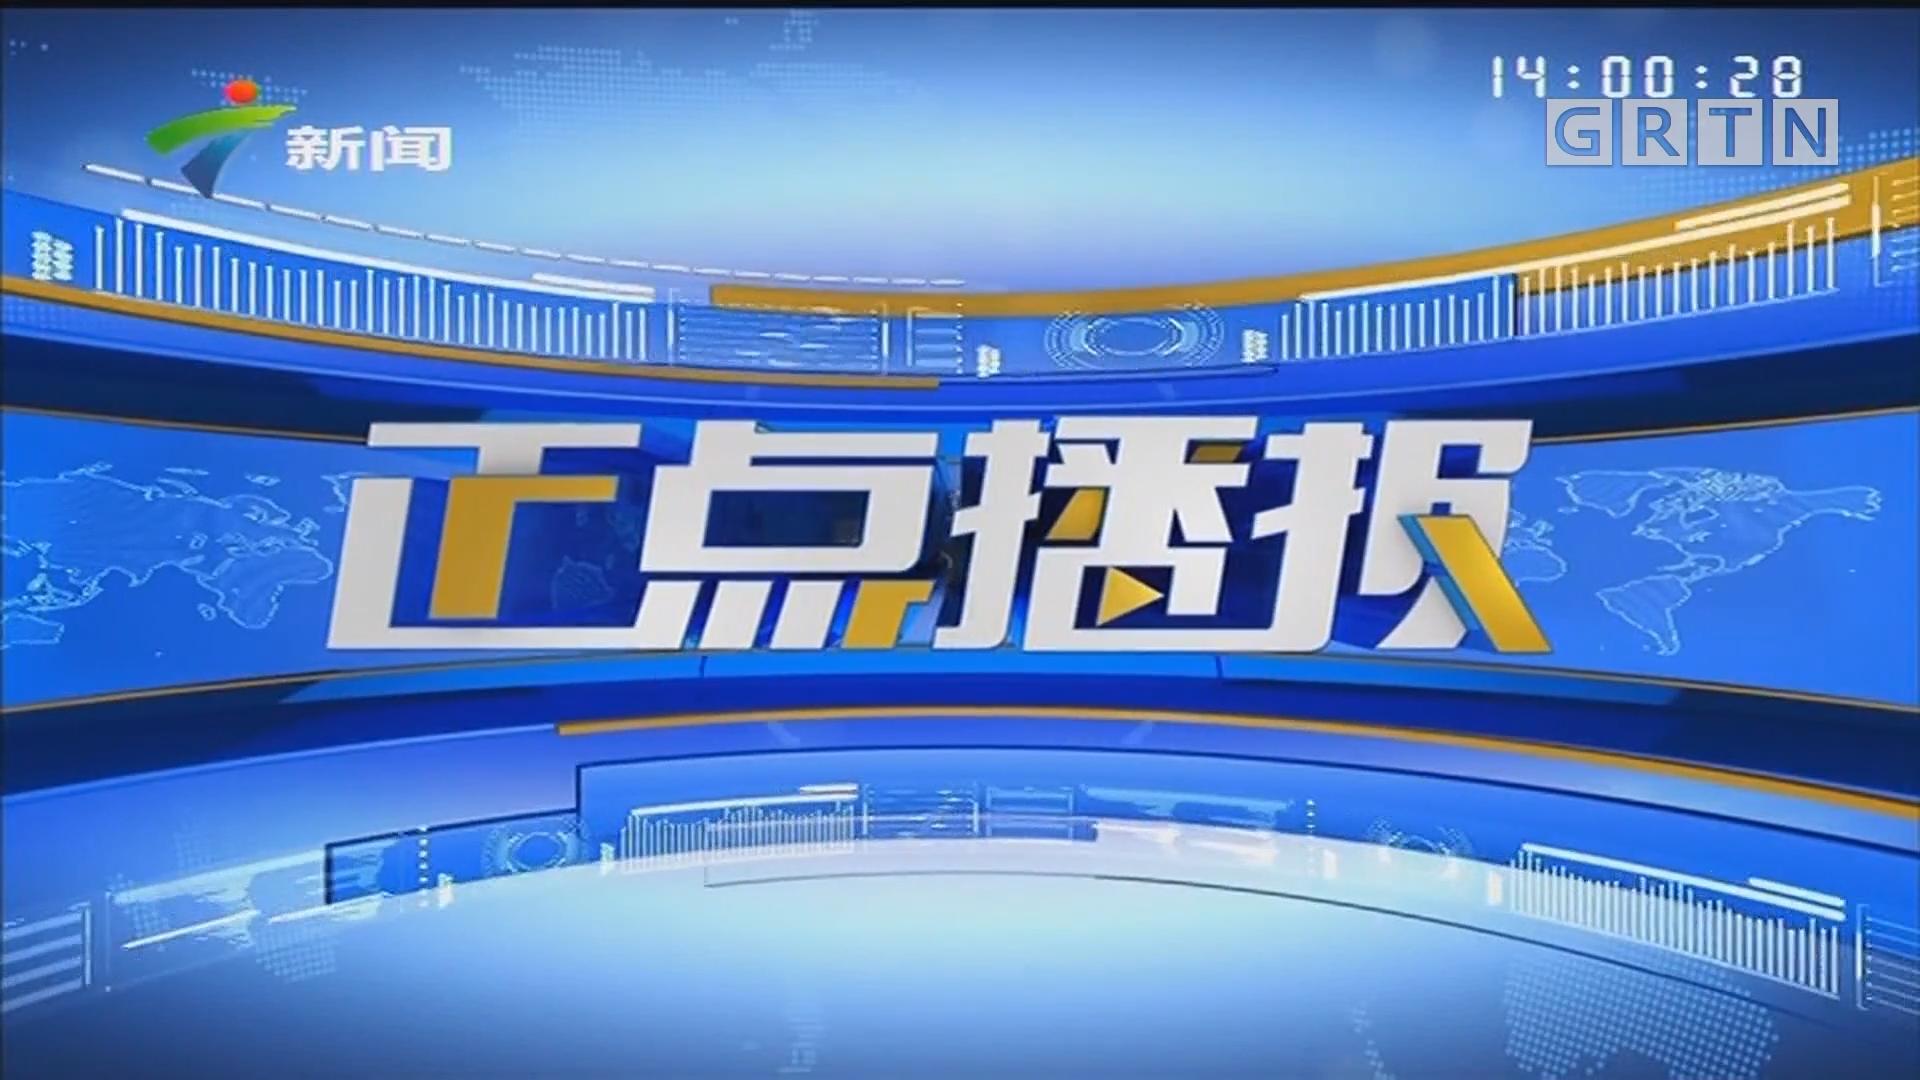 [HD][2019-10-05]正点播报:南粤大地欢庆国庆巡礼 广州:国庆群众文艺嘉年华